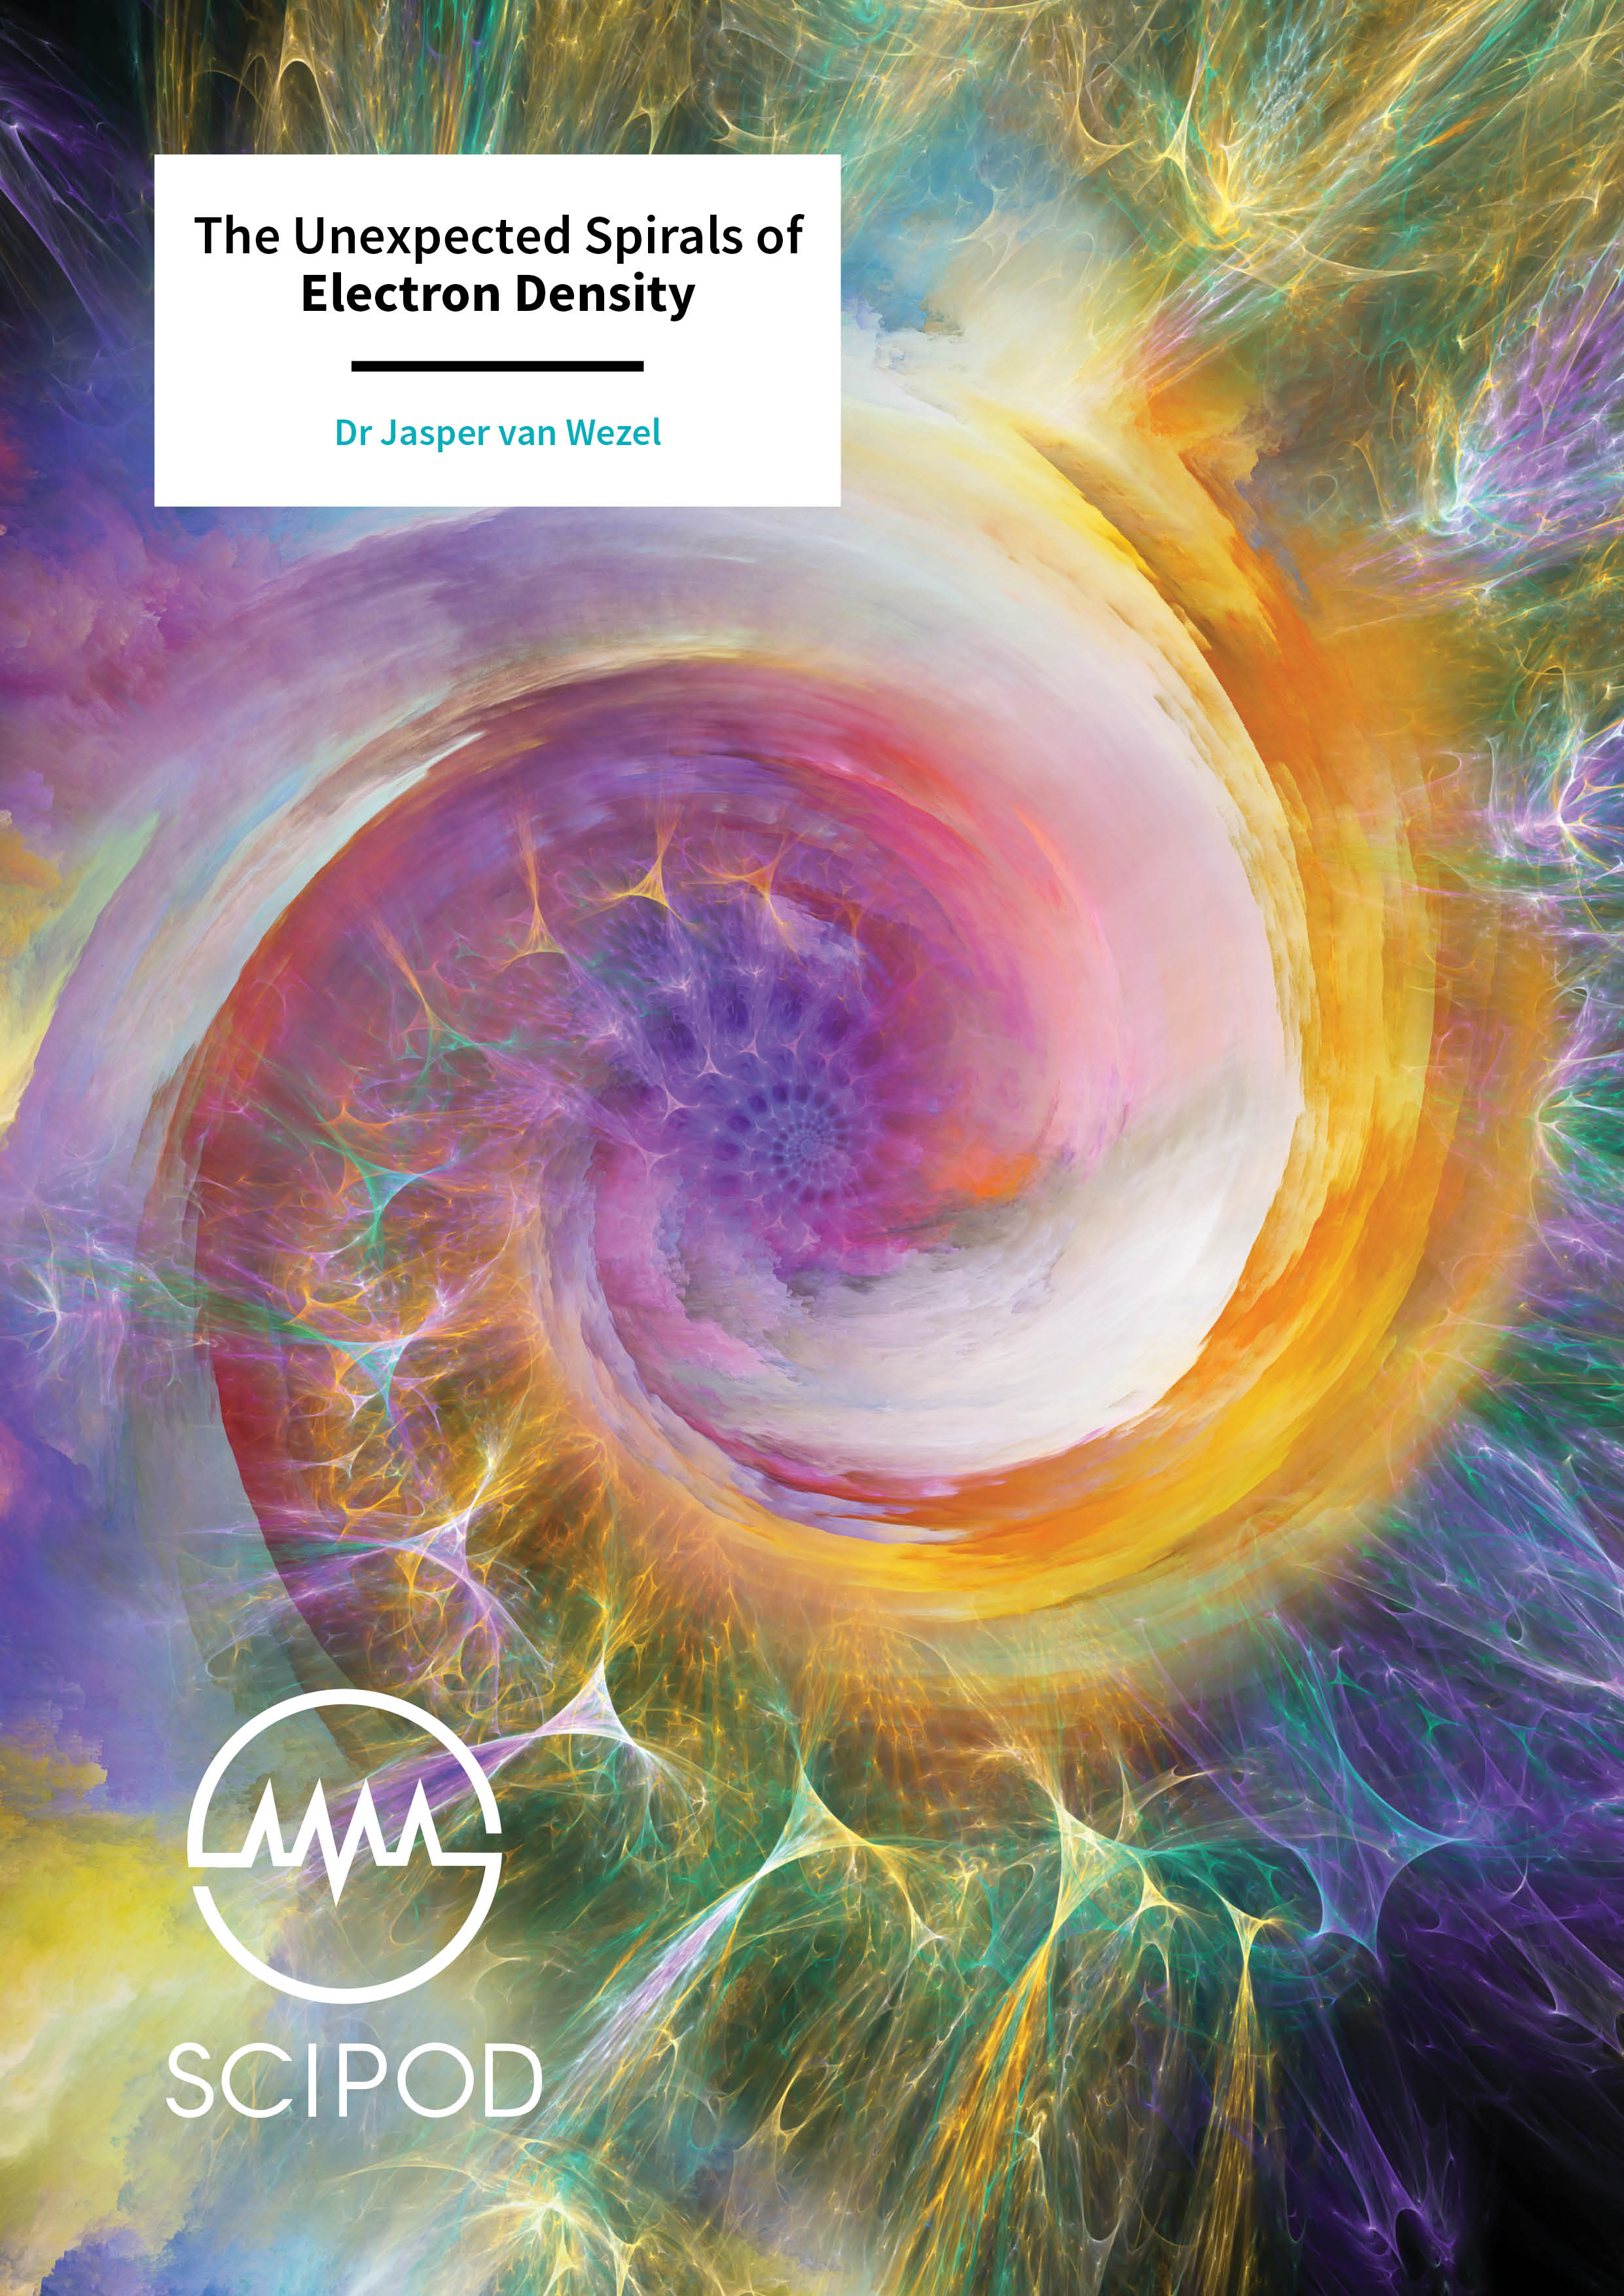 The Unexpected Spirals of Electron Density - Dr Jasper van Wezel, University of Amsterdam